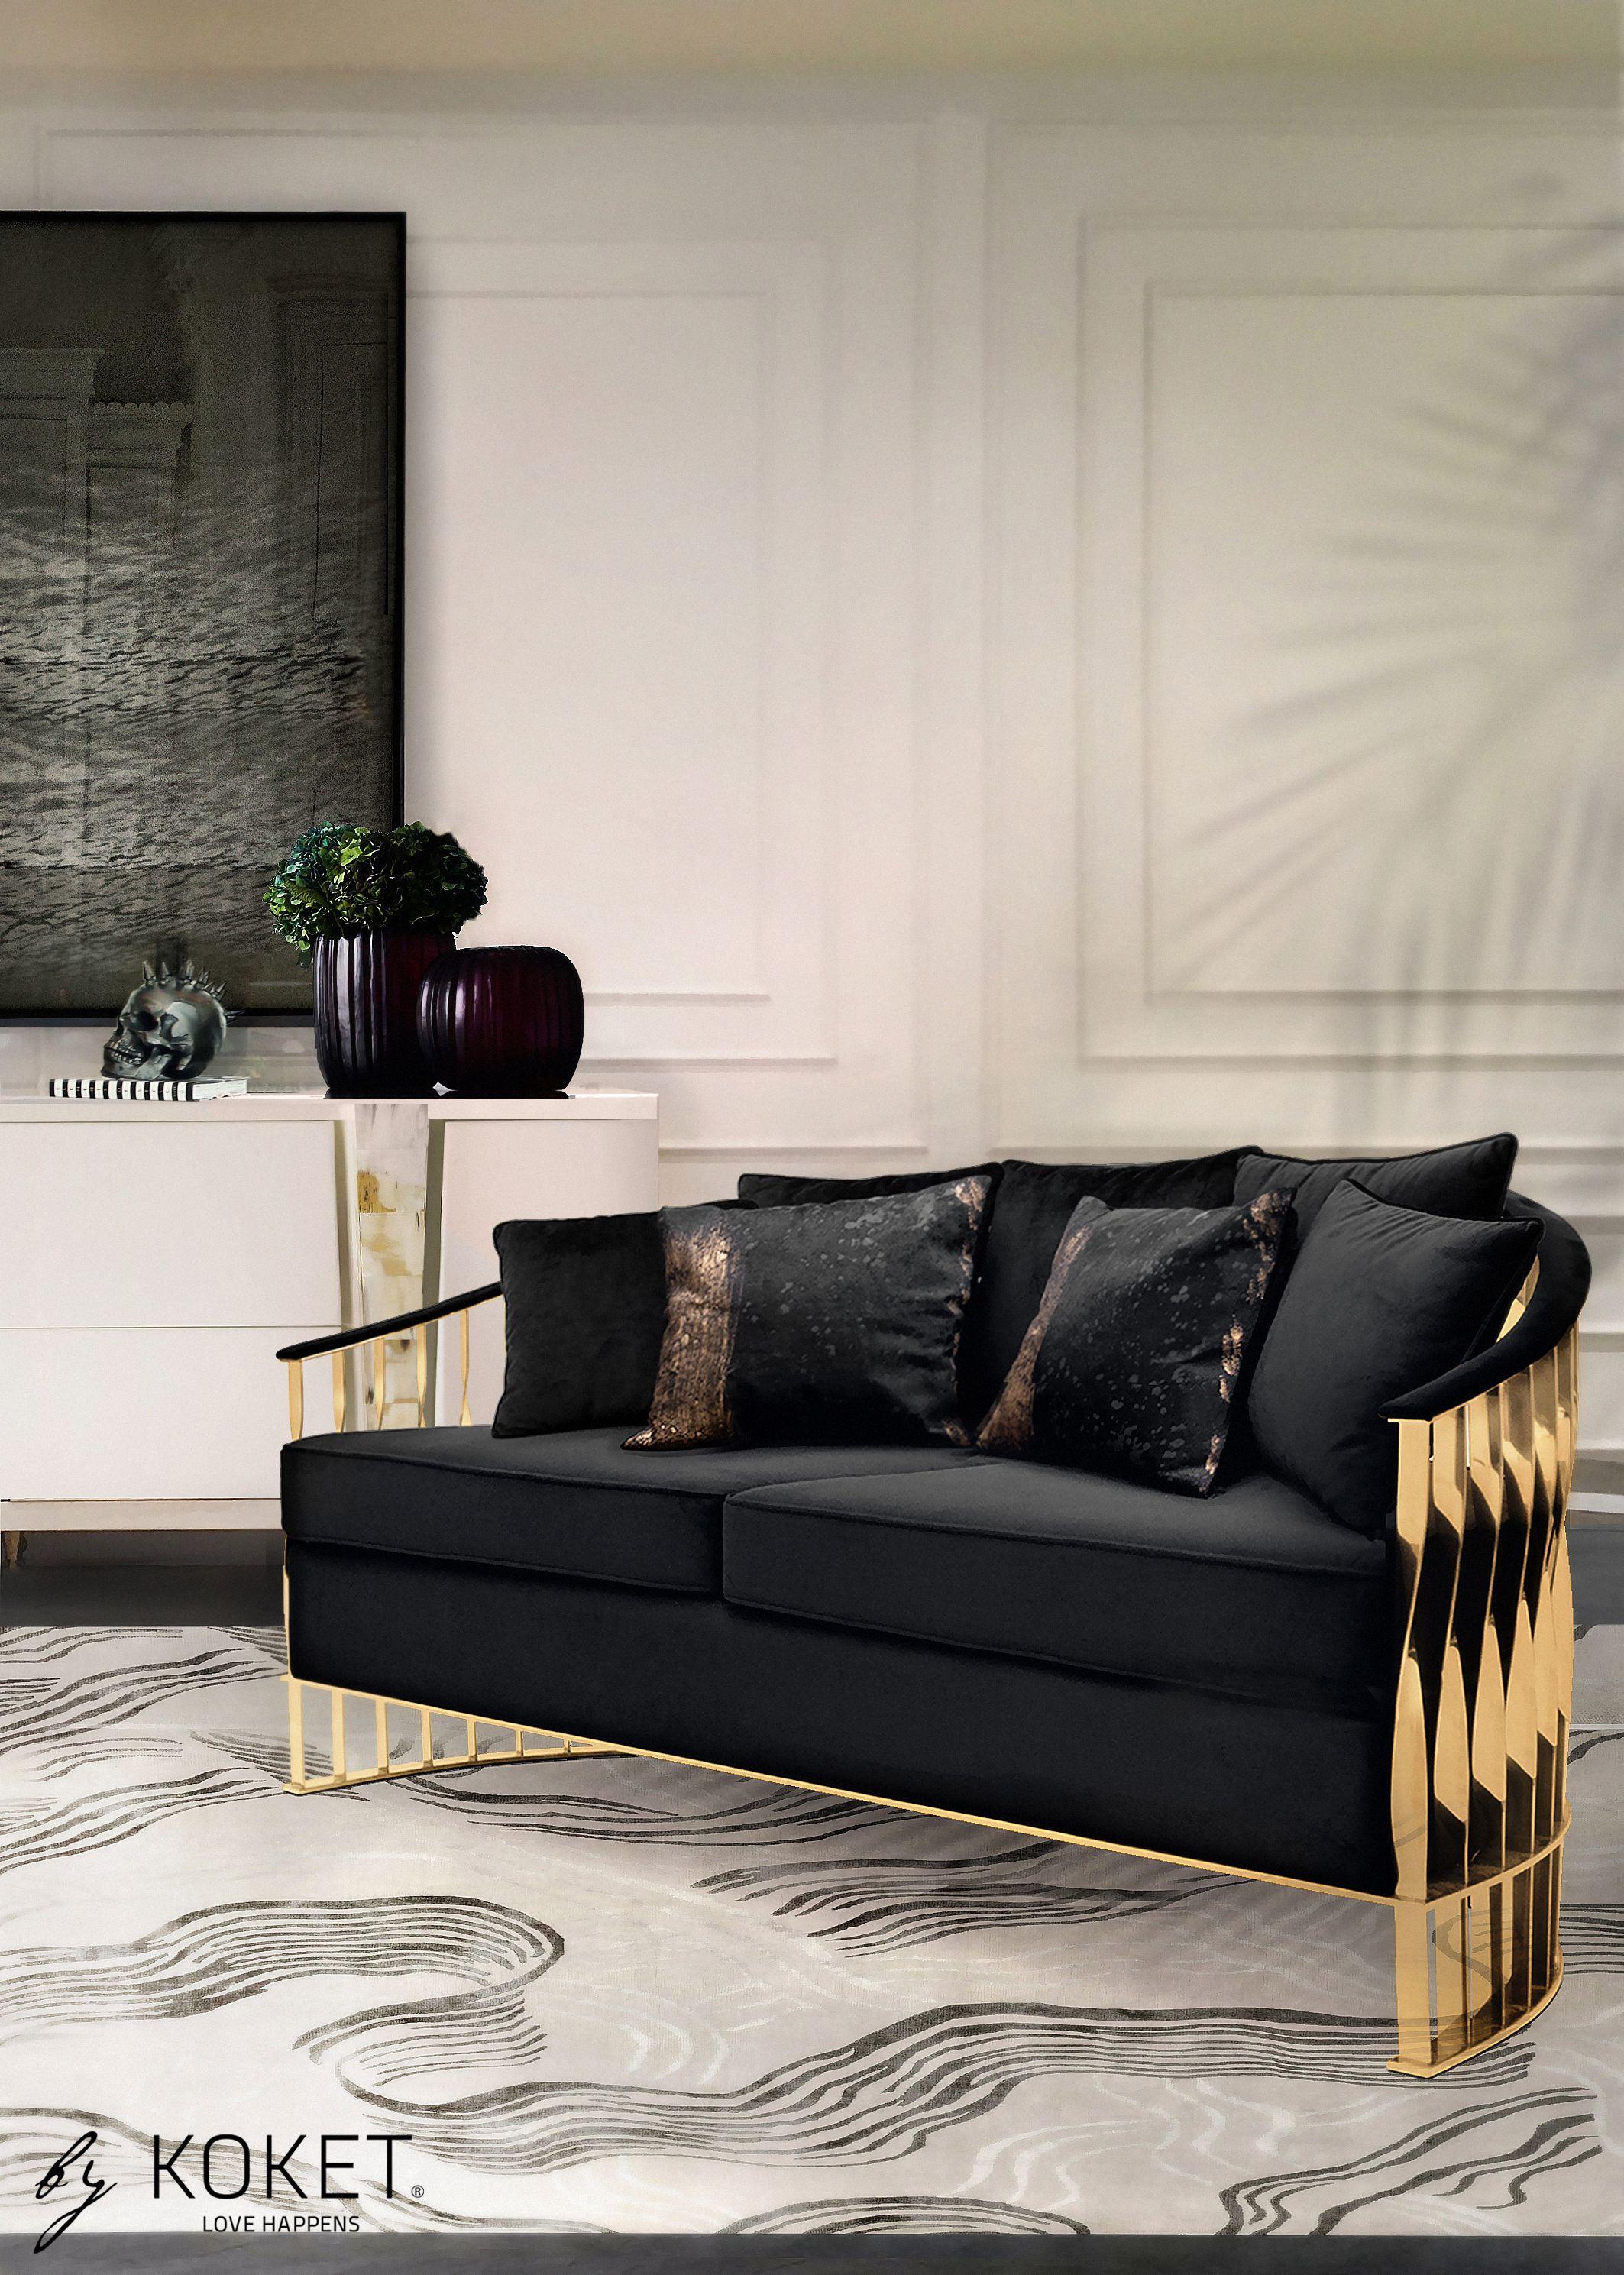 Mandy Sofa Sofa Design By Koket Sofa Design Living Room Inspiration Interior Design Projects #unusual #living #room #furniture